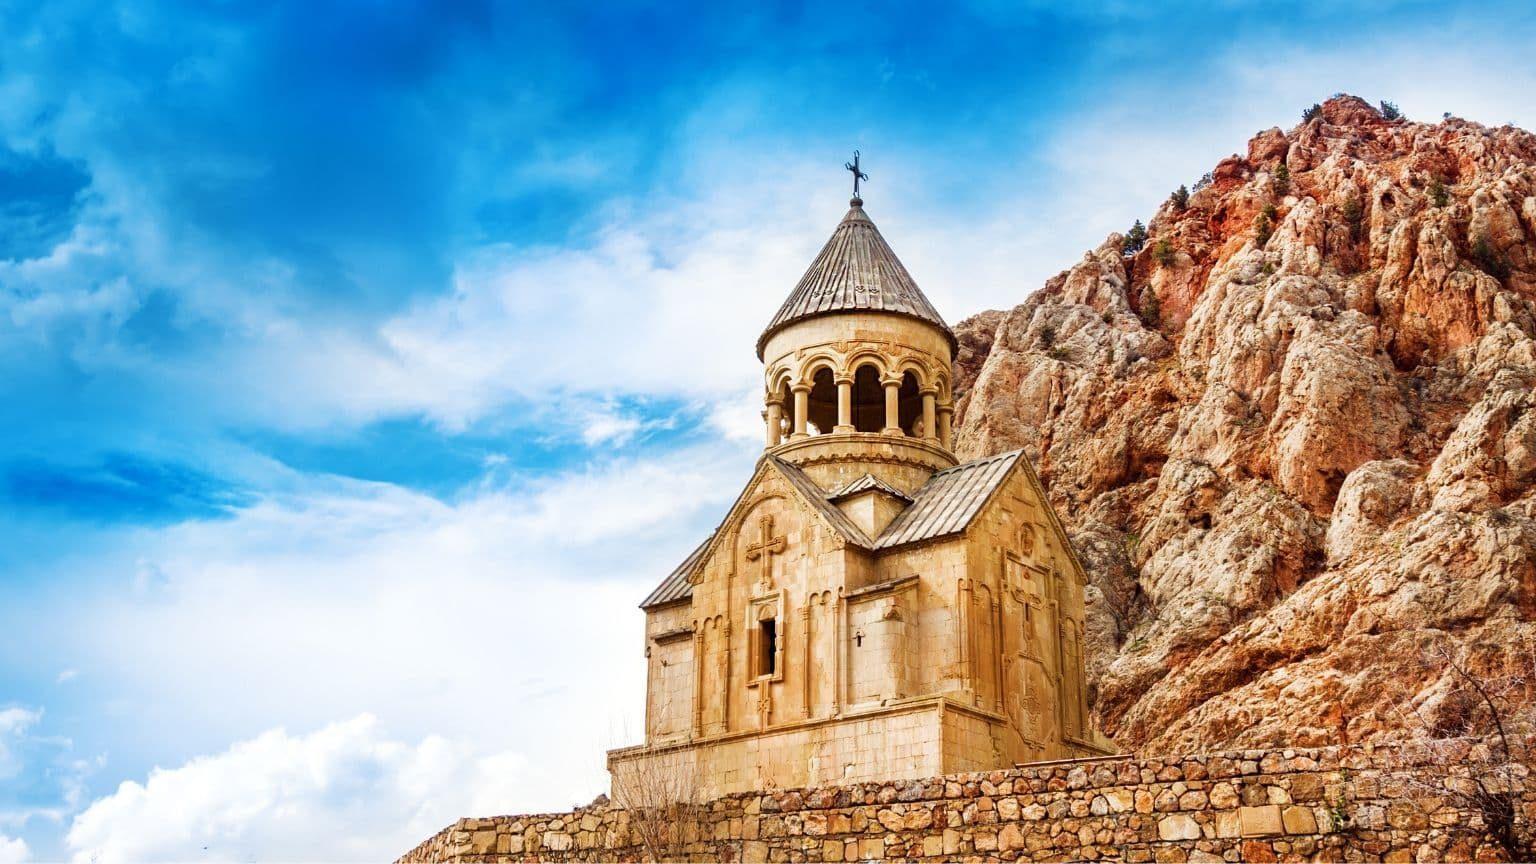 Novarank monastery in Armenia